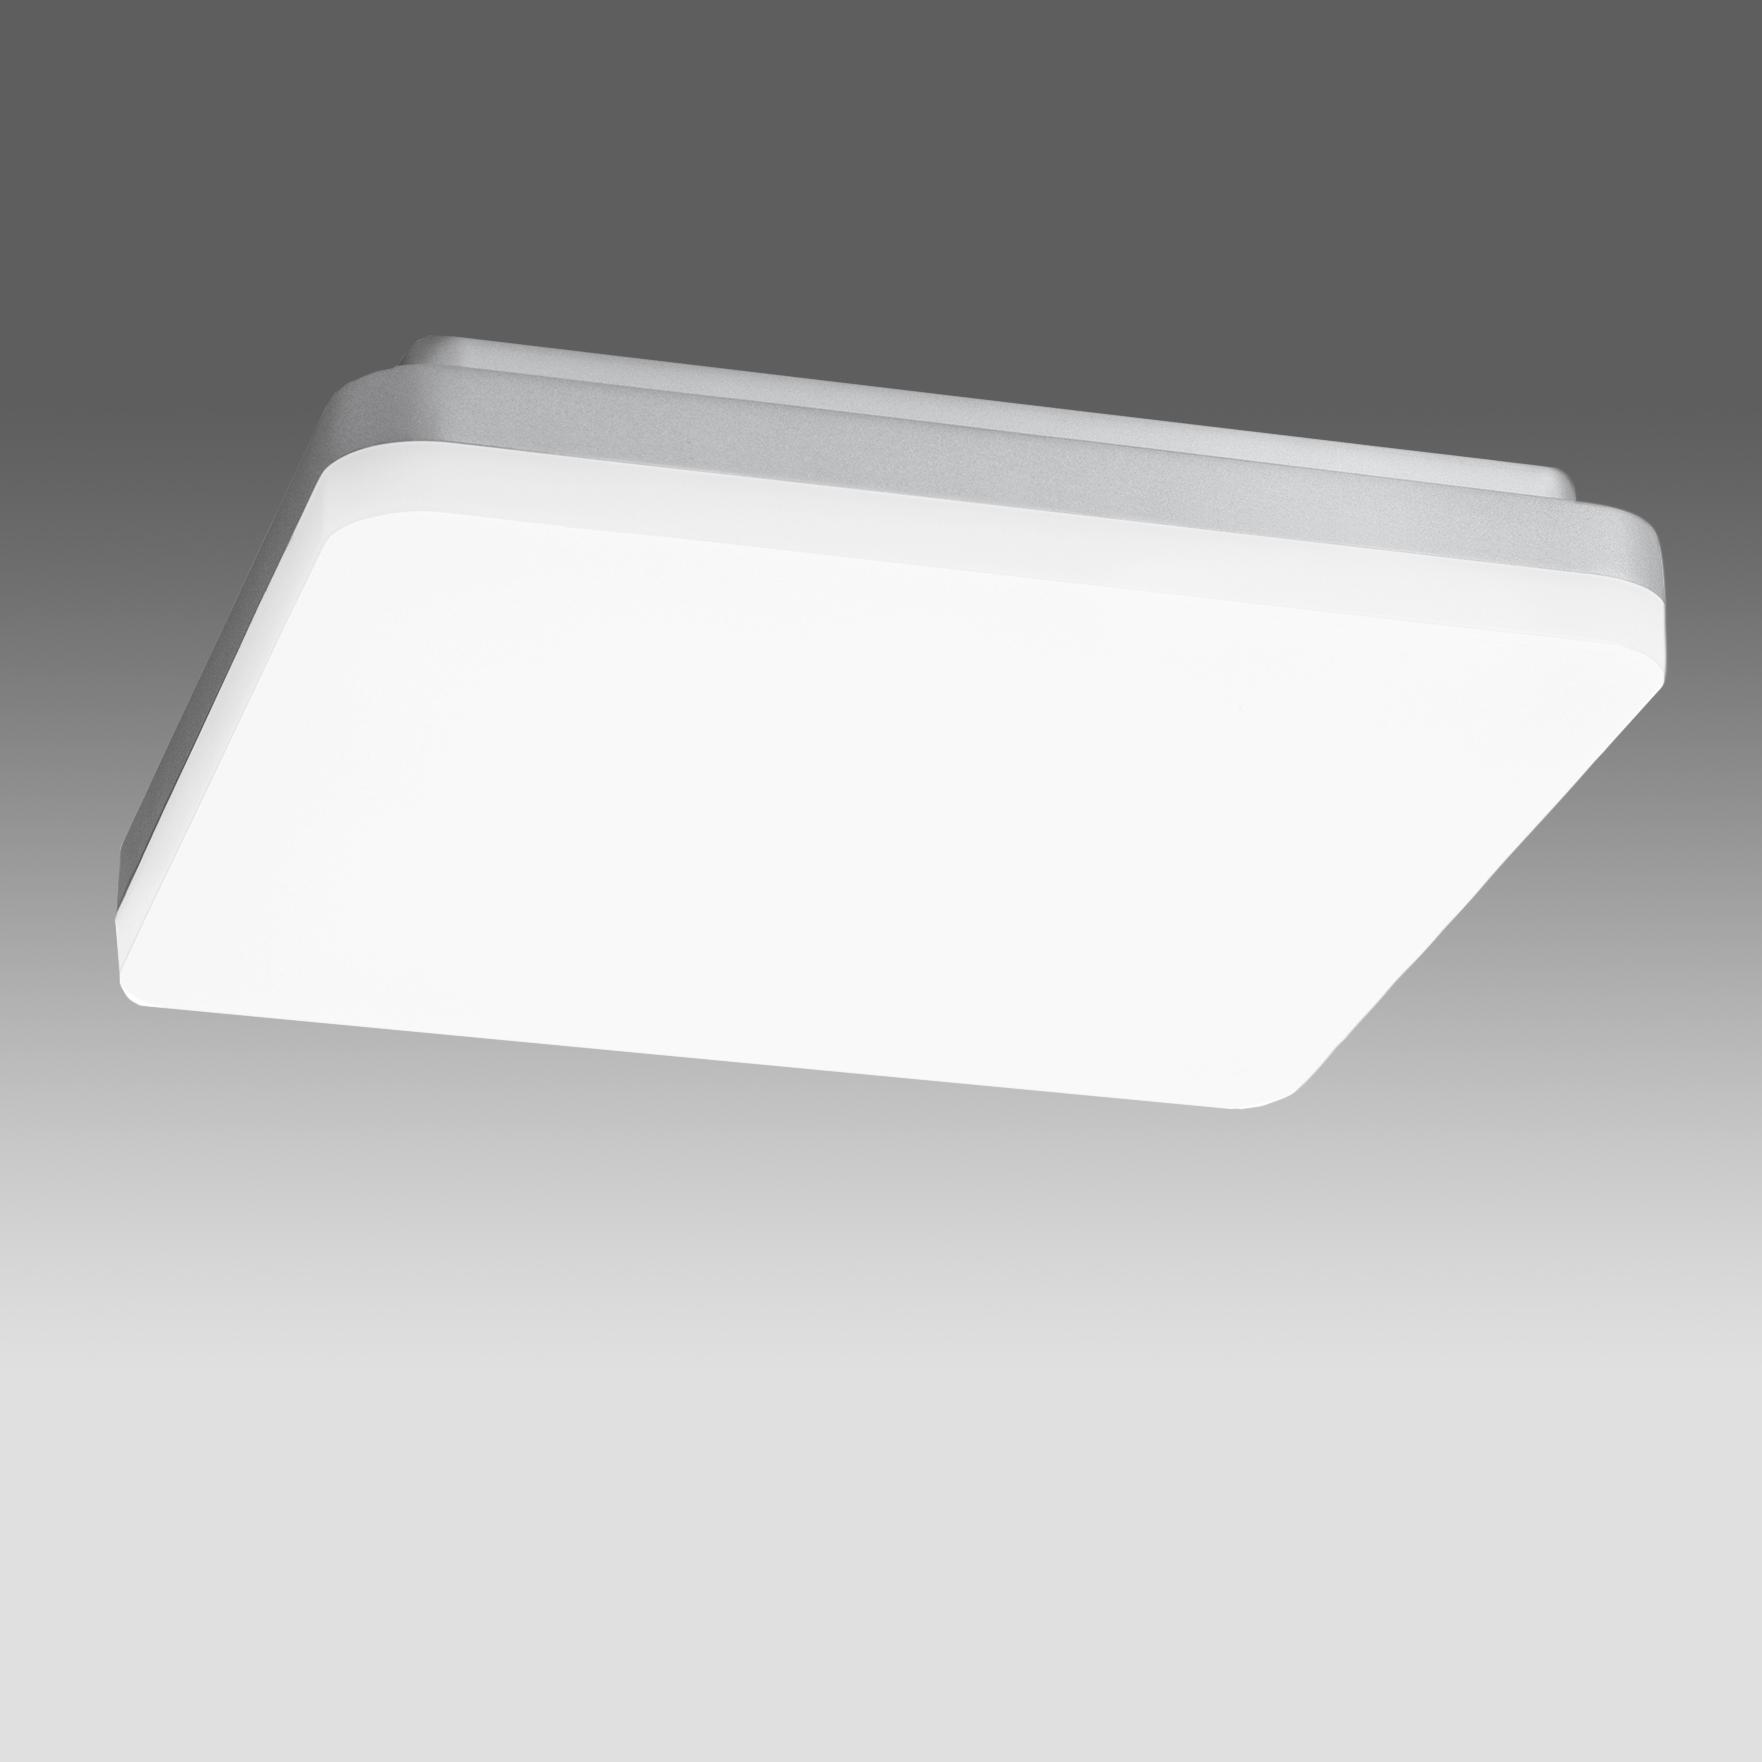 1 Stk Elegance Square II 15W 1500lm 3000K Triac Dim IP44 silber LILE0030--